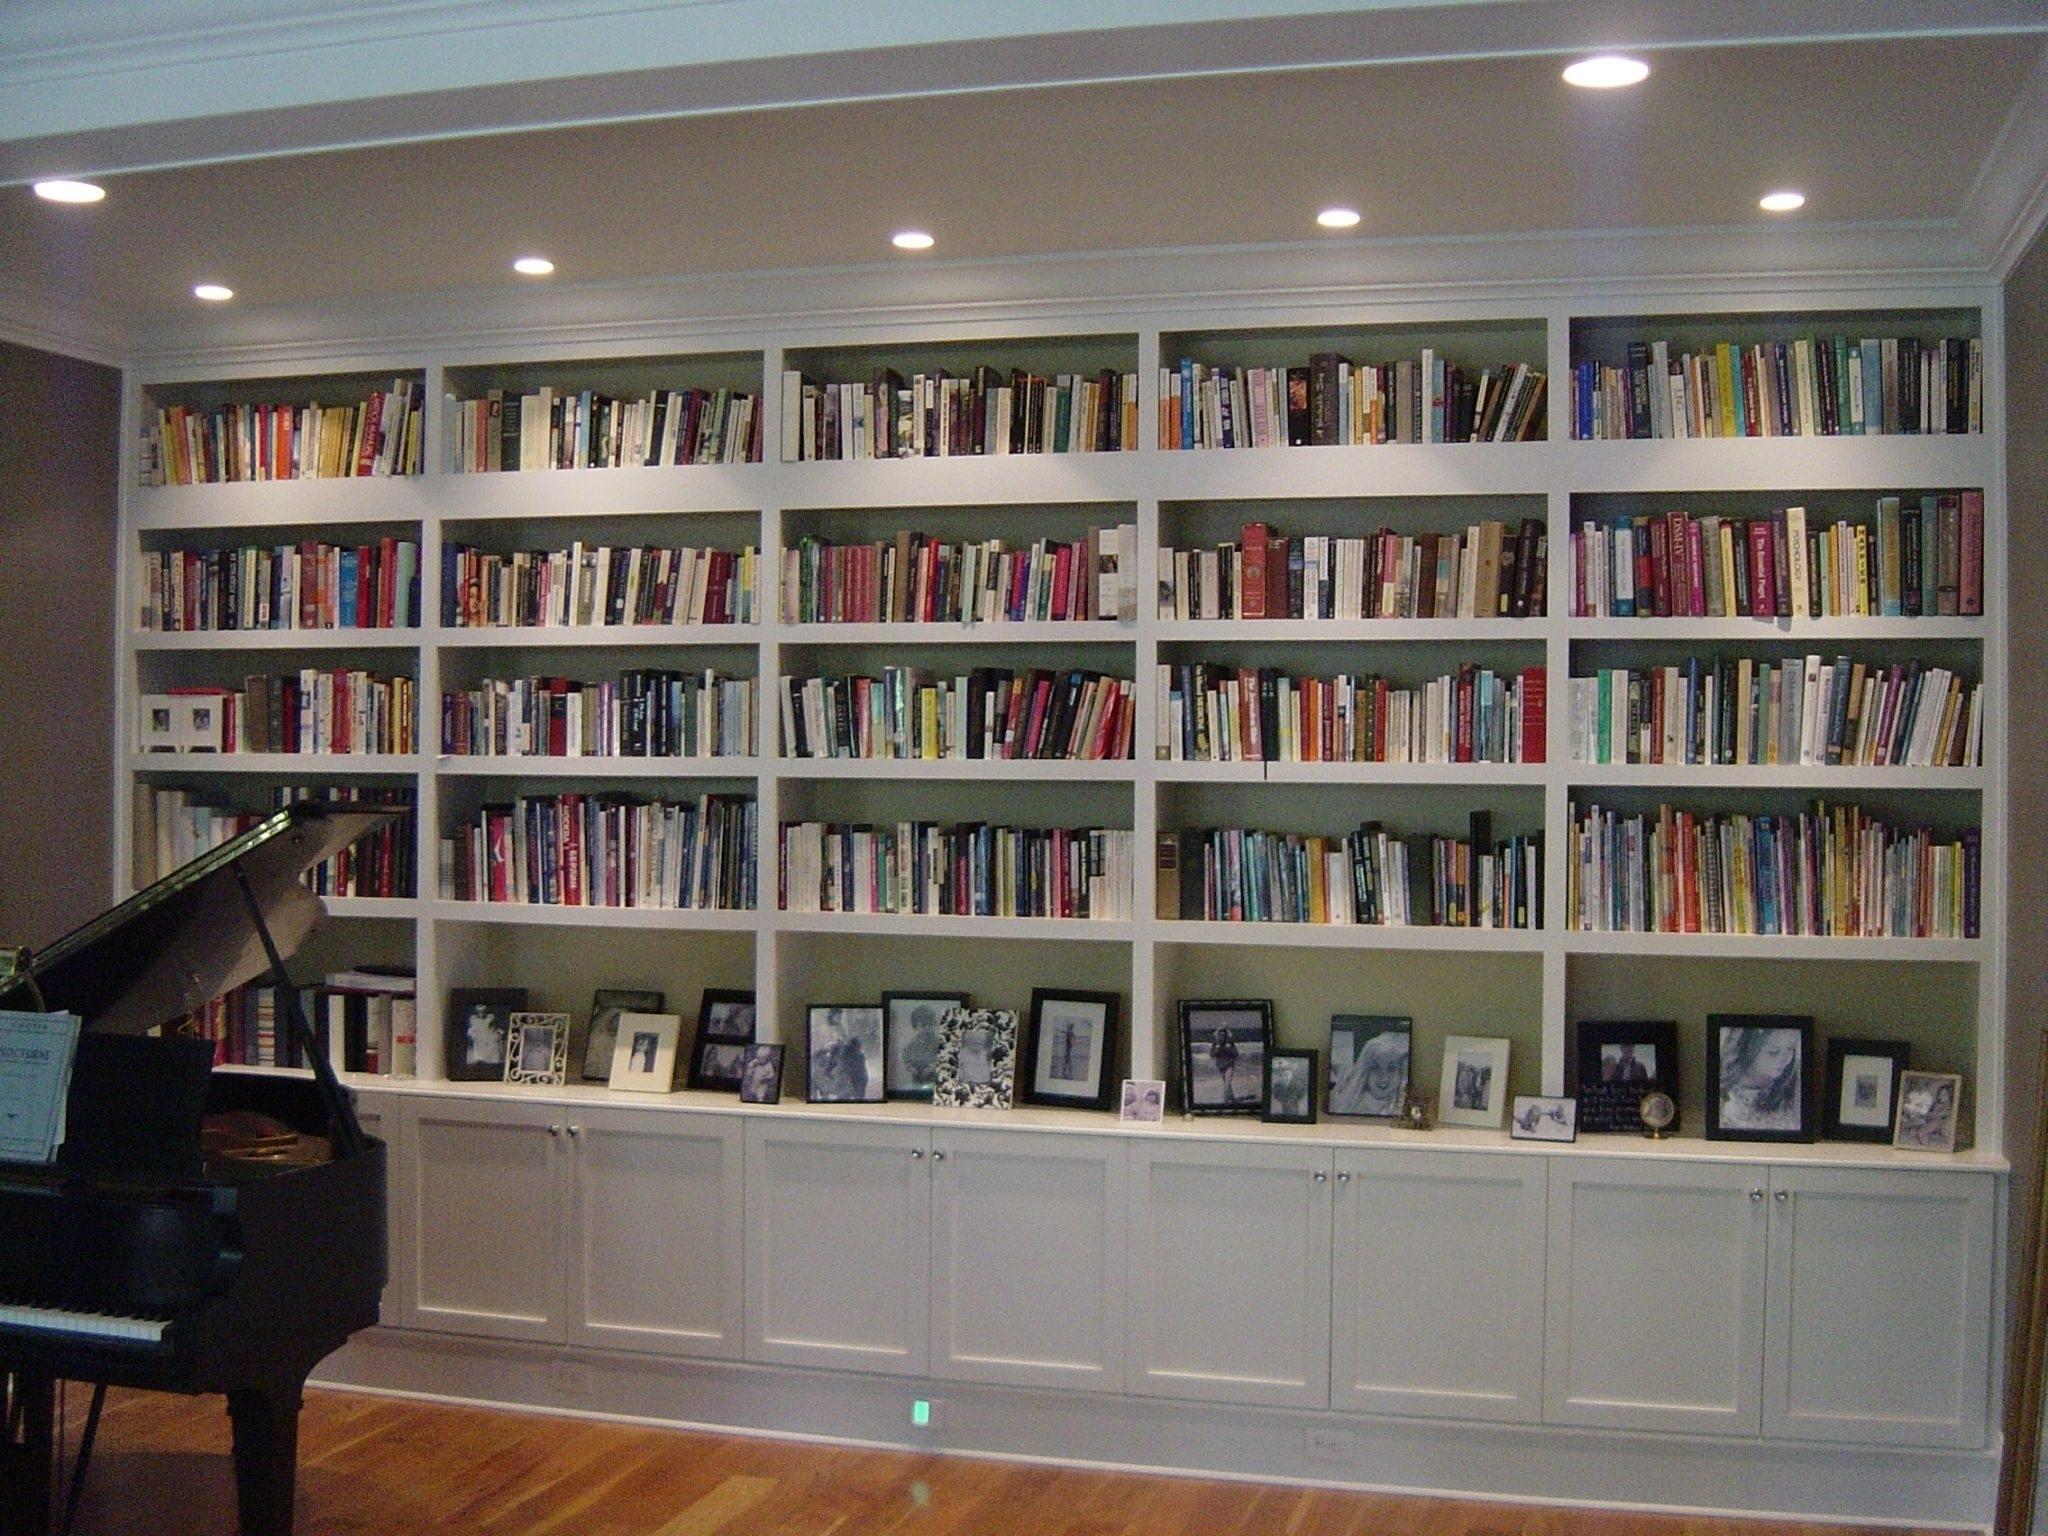 Cheap Bookshelves Regarding Famous Best Cheap Bookshelves American Hwy ~ Idolza (View 6 of 15)